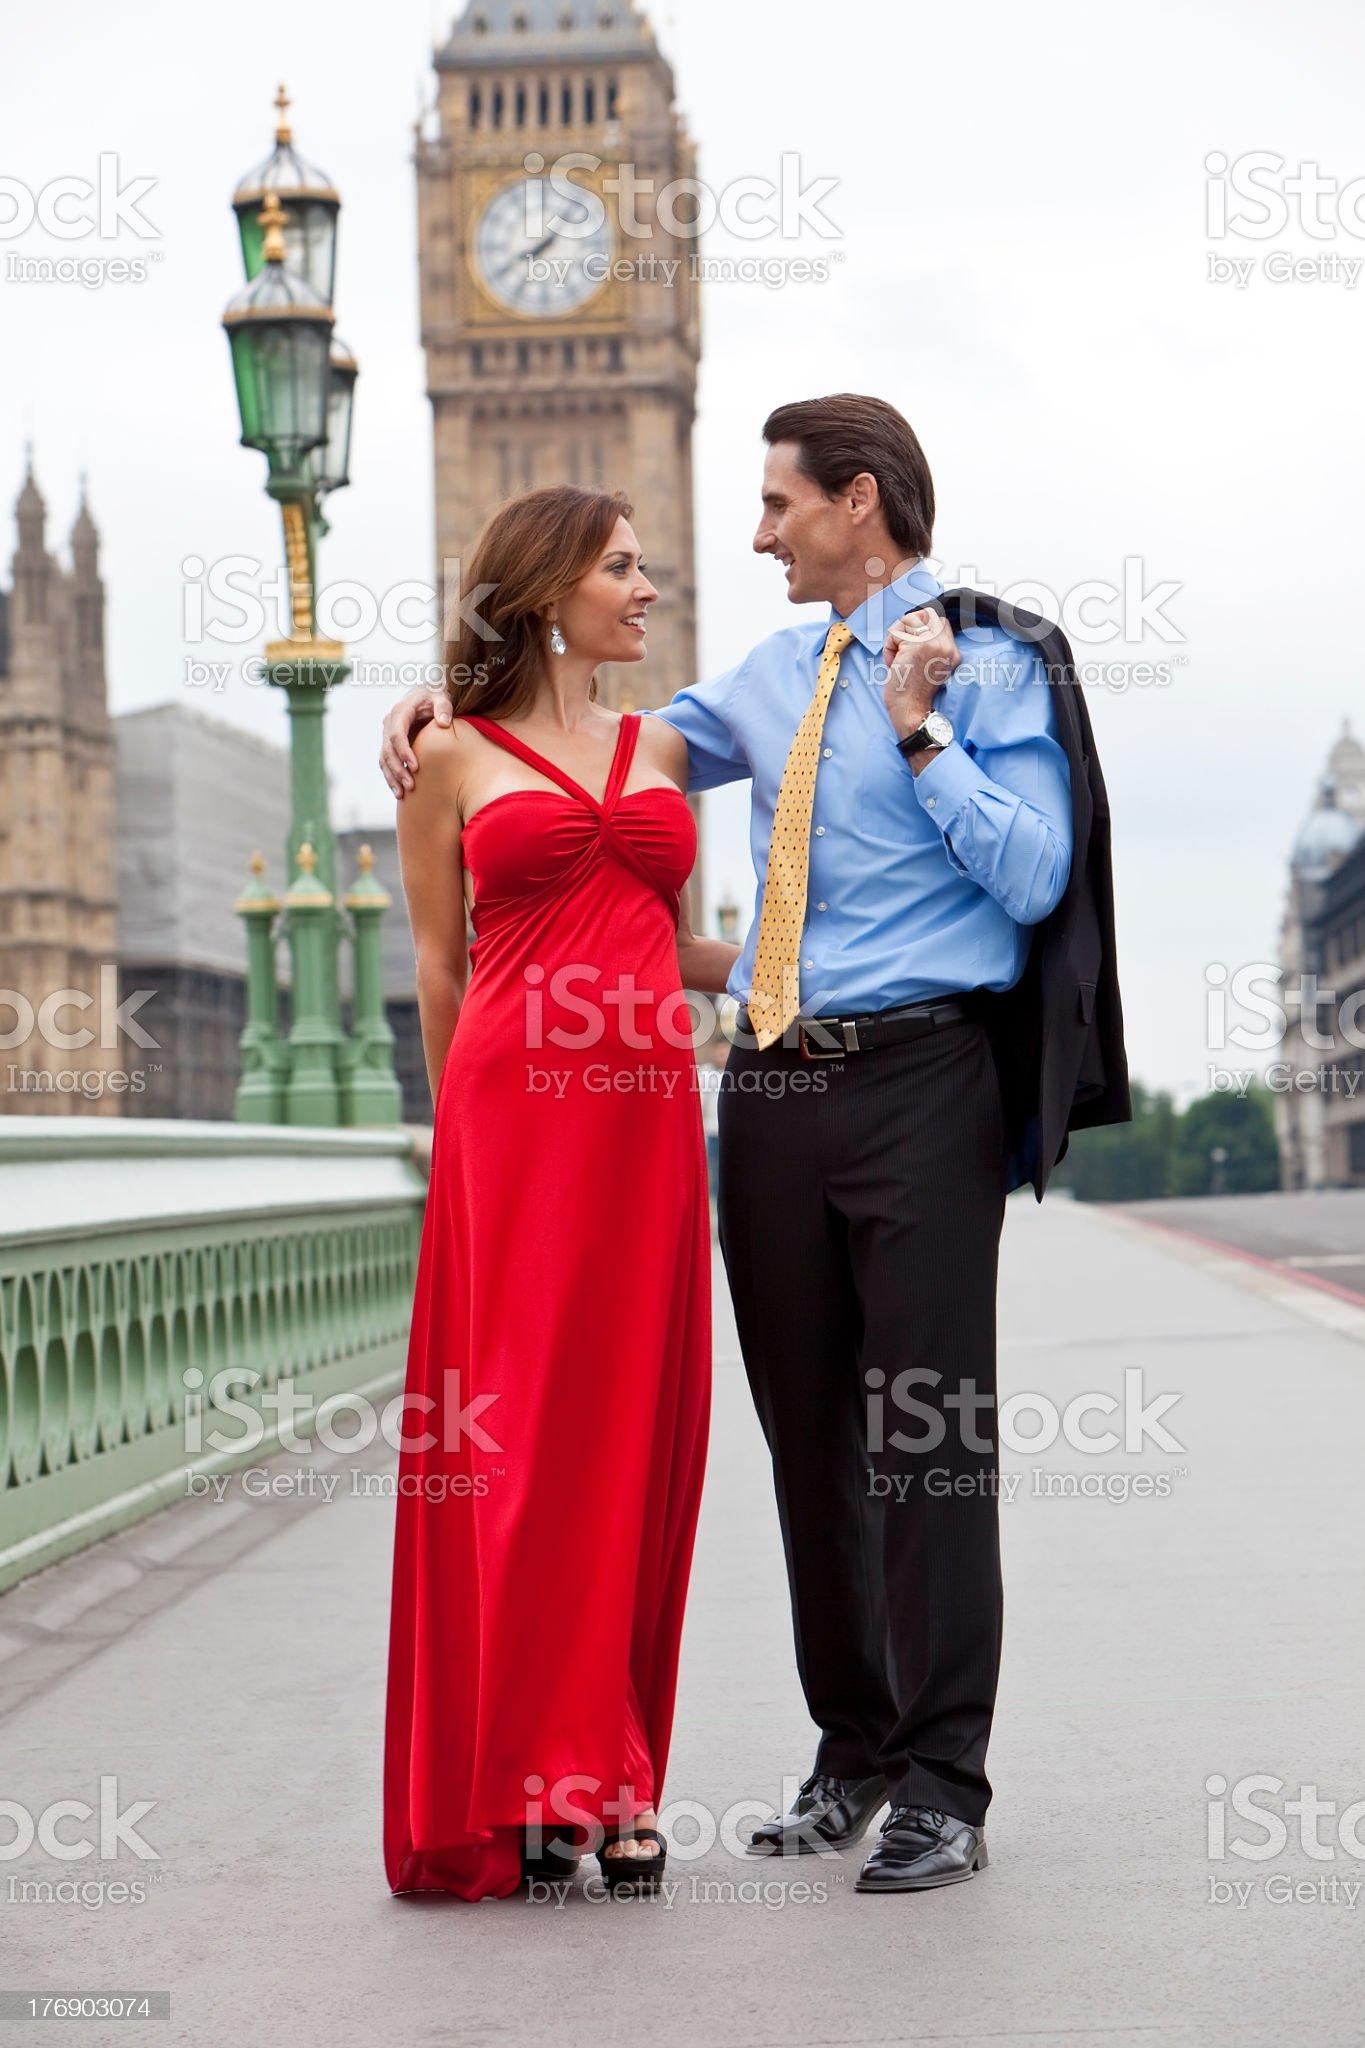 Romantic Couple on Westminster Bridge by Big Ben, London, England royalty-free stock photo